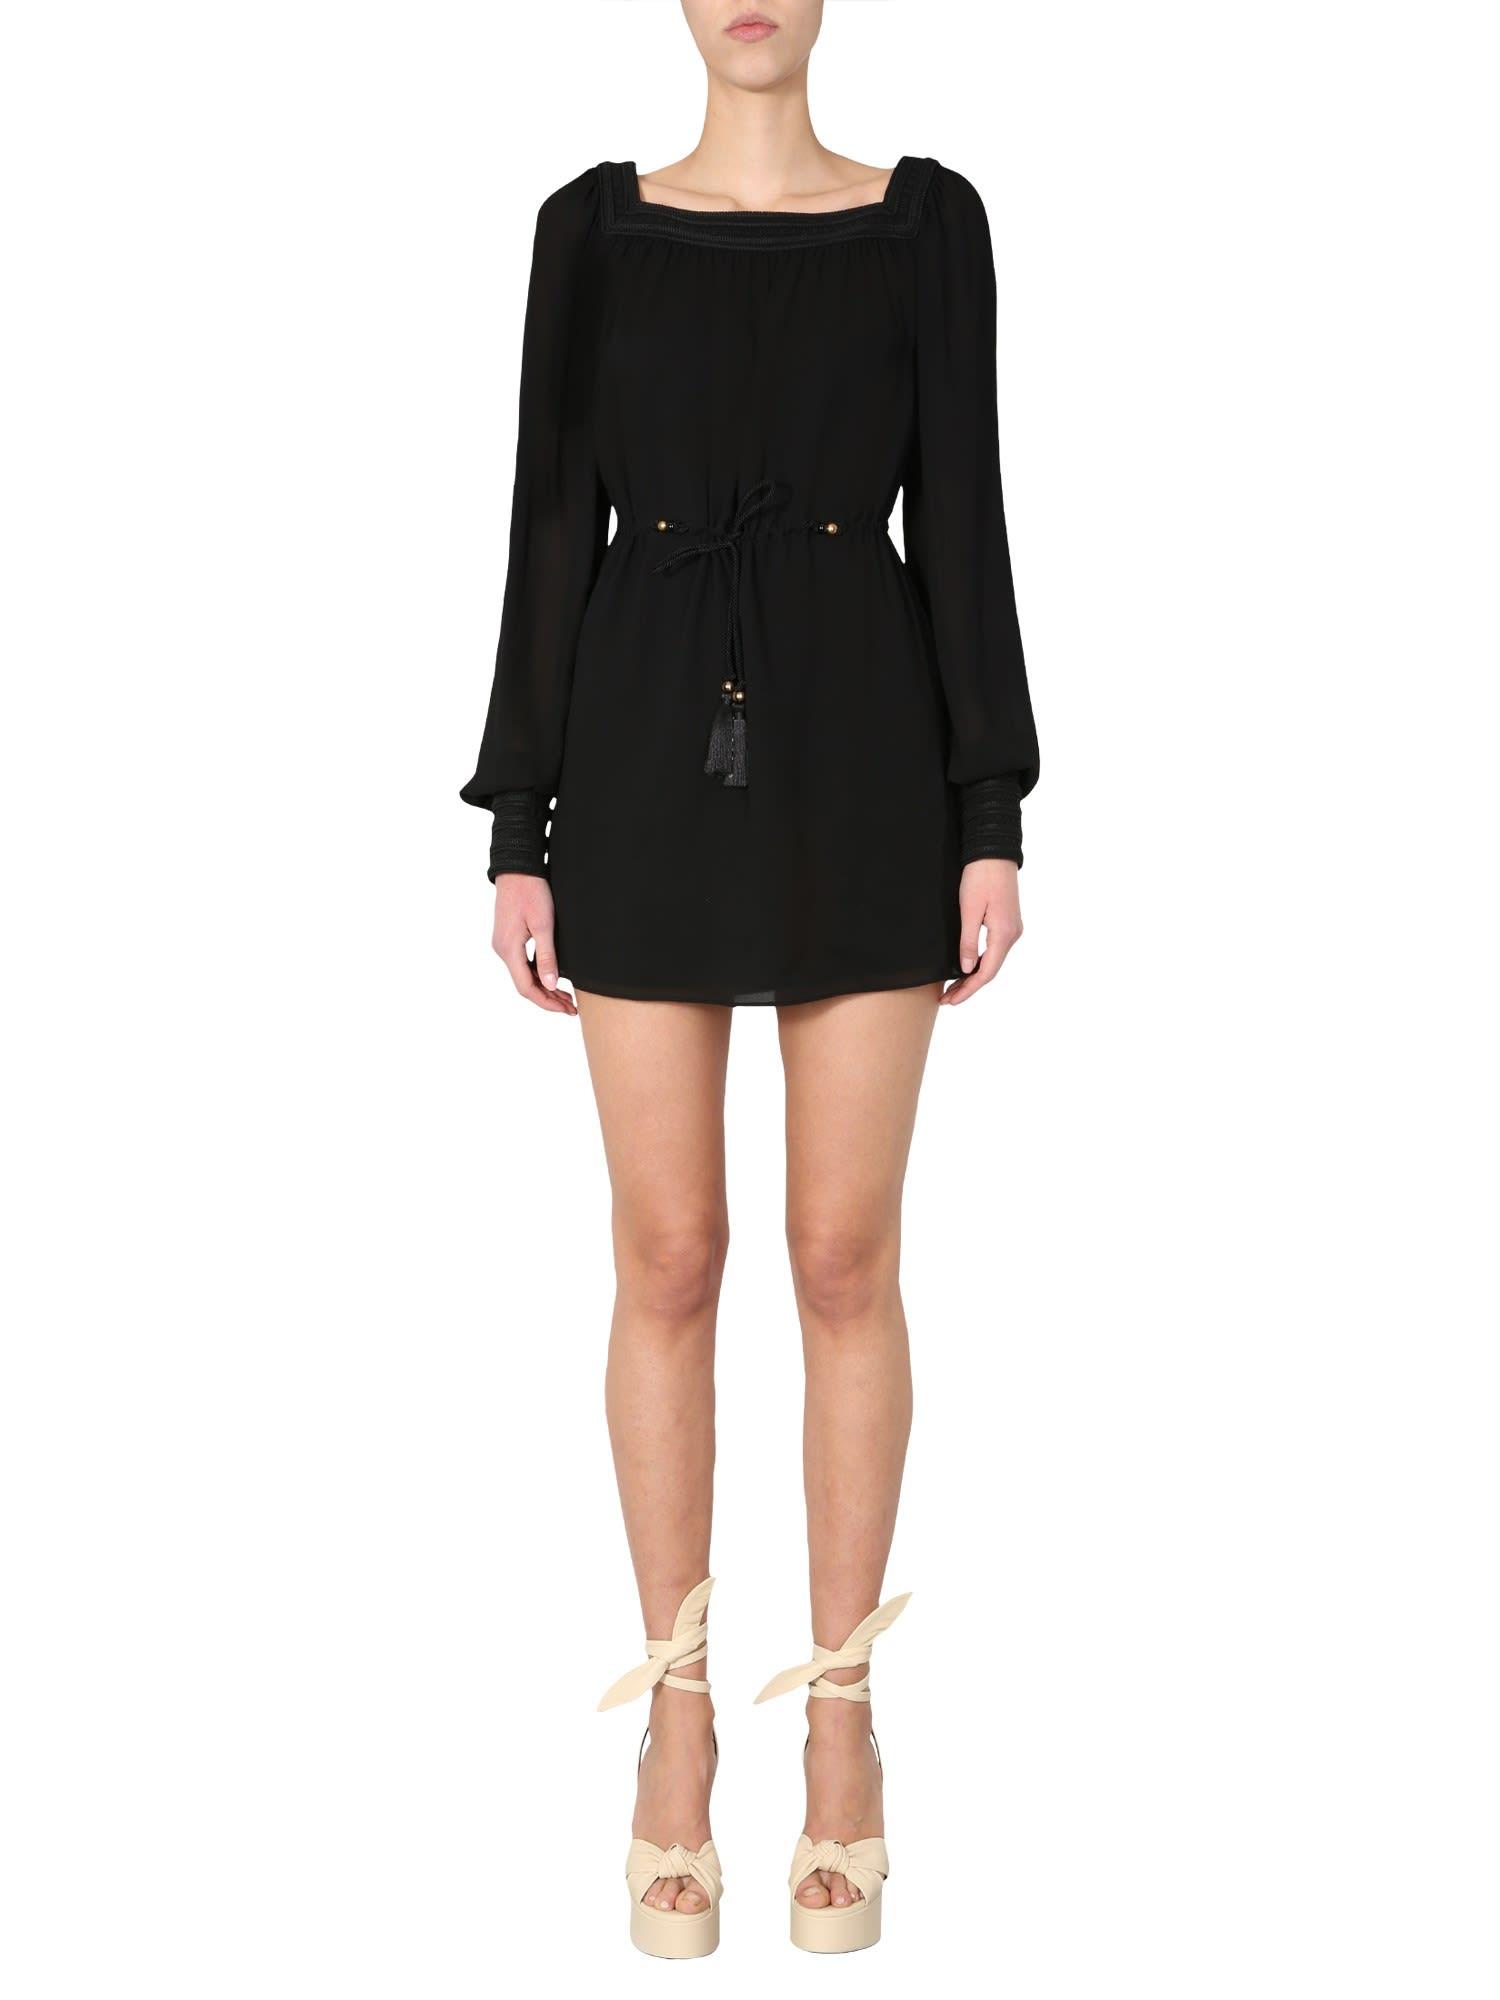 Saint Laurent Long Sleeved Dress